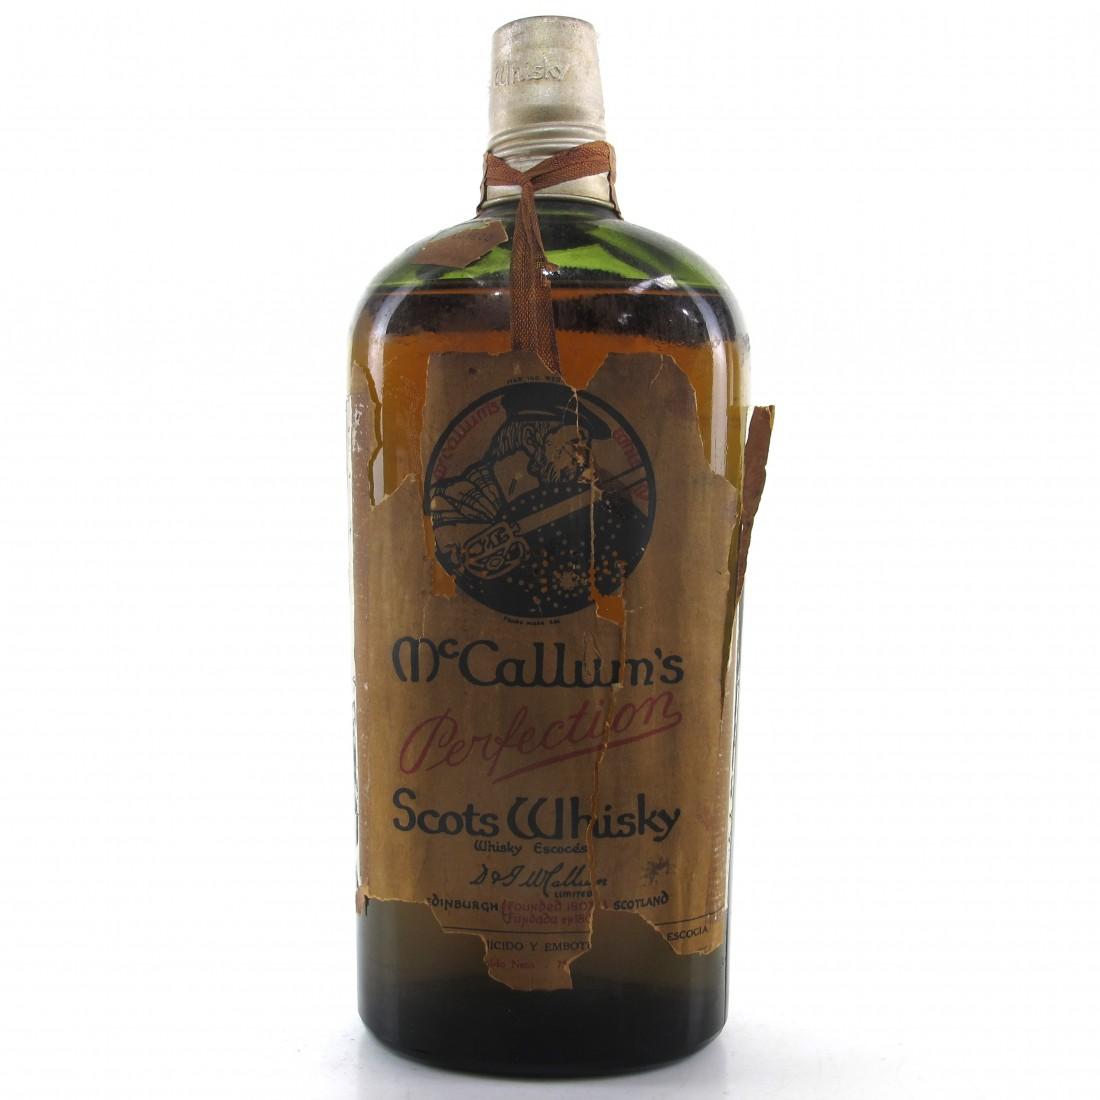 McCallum's Perfection Scots Whisky 1960s